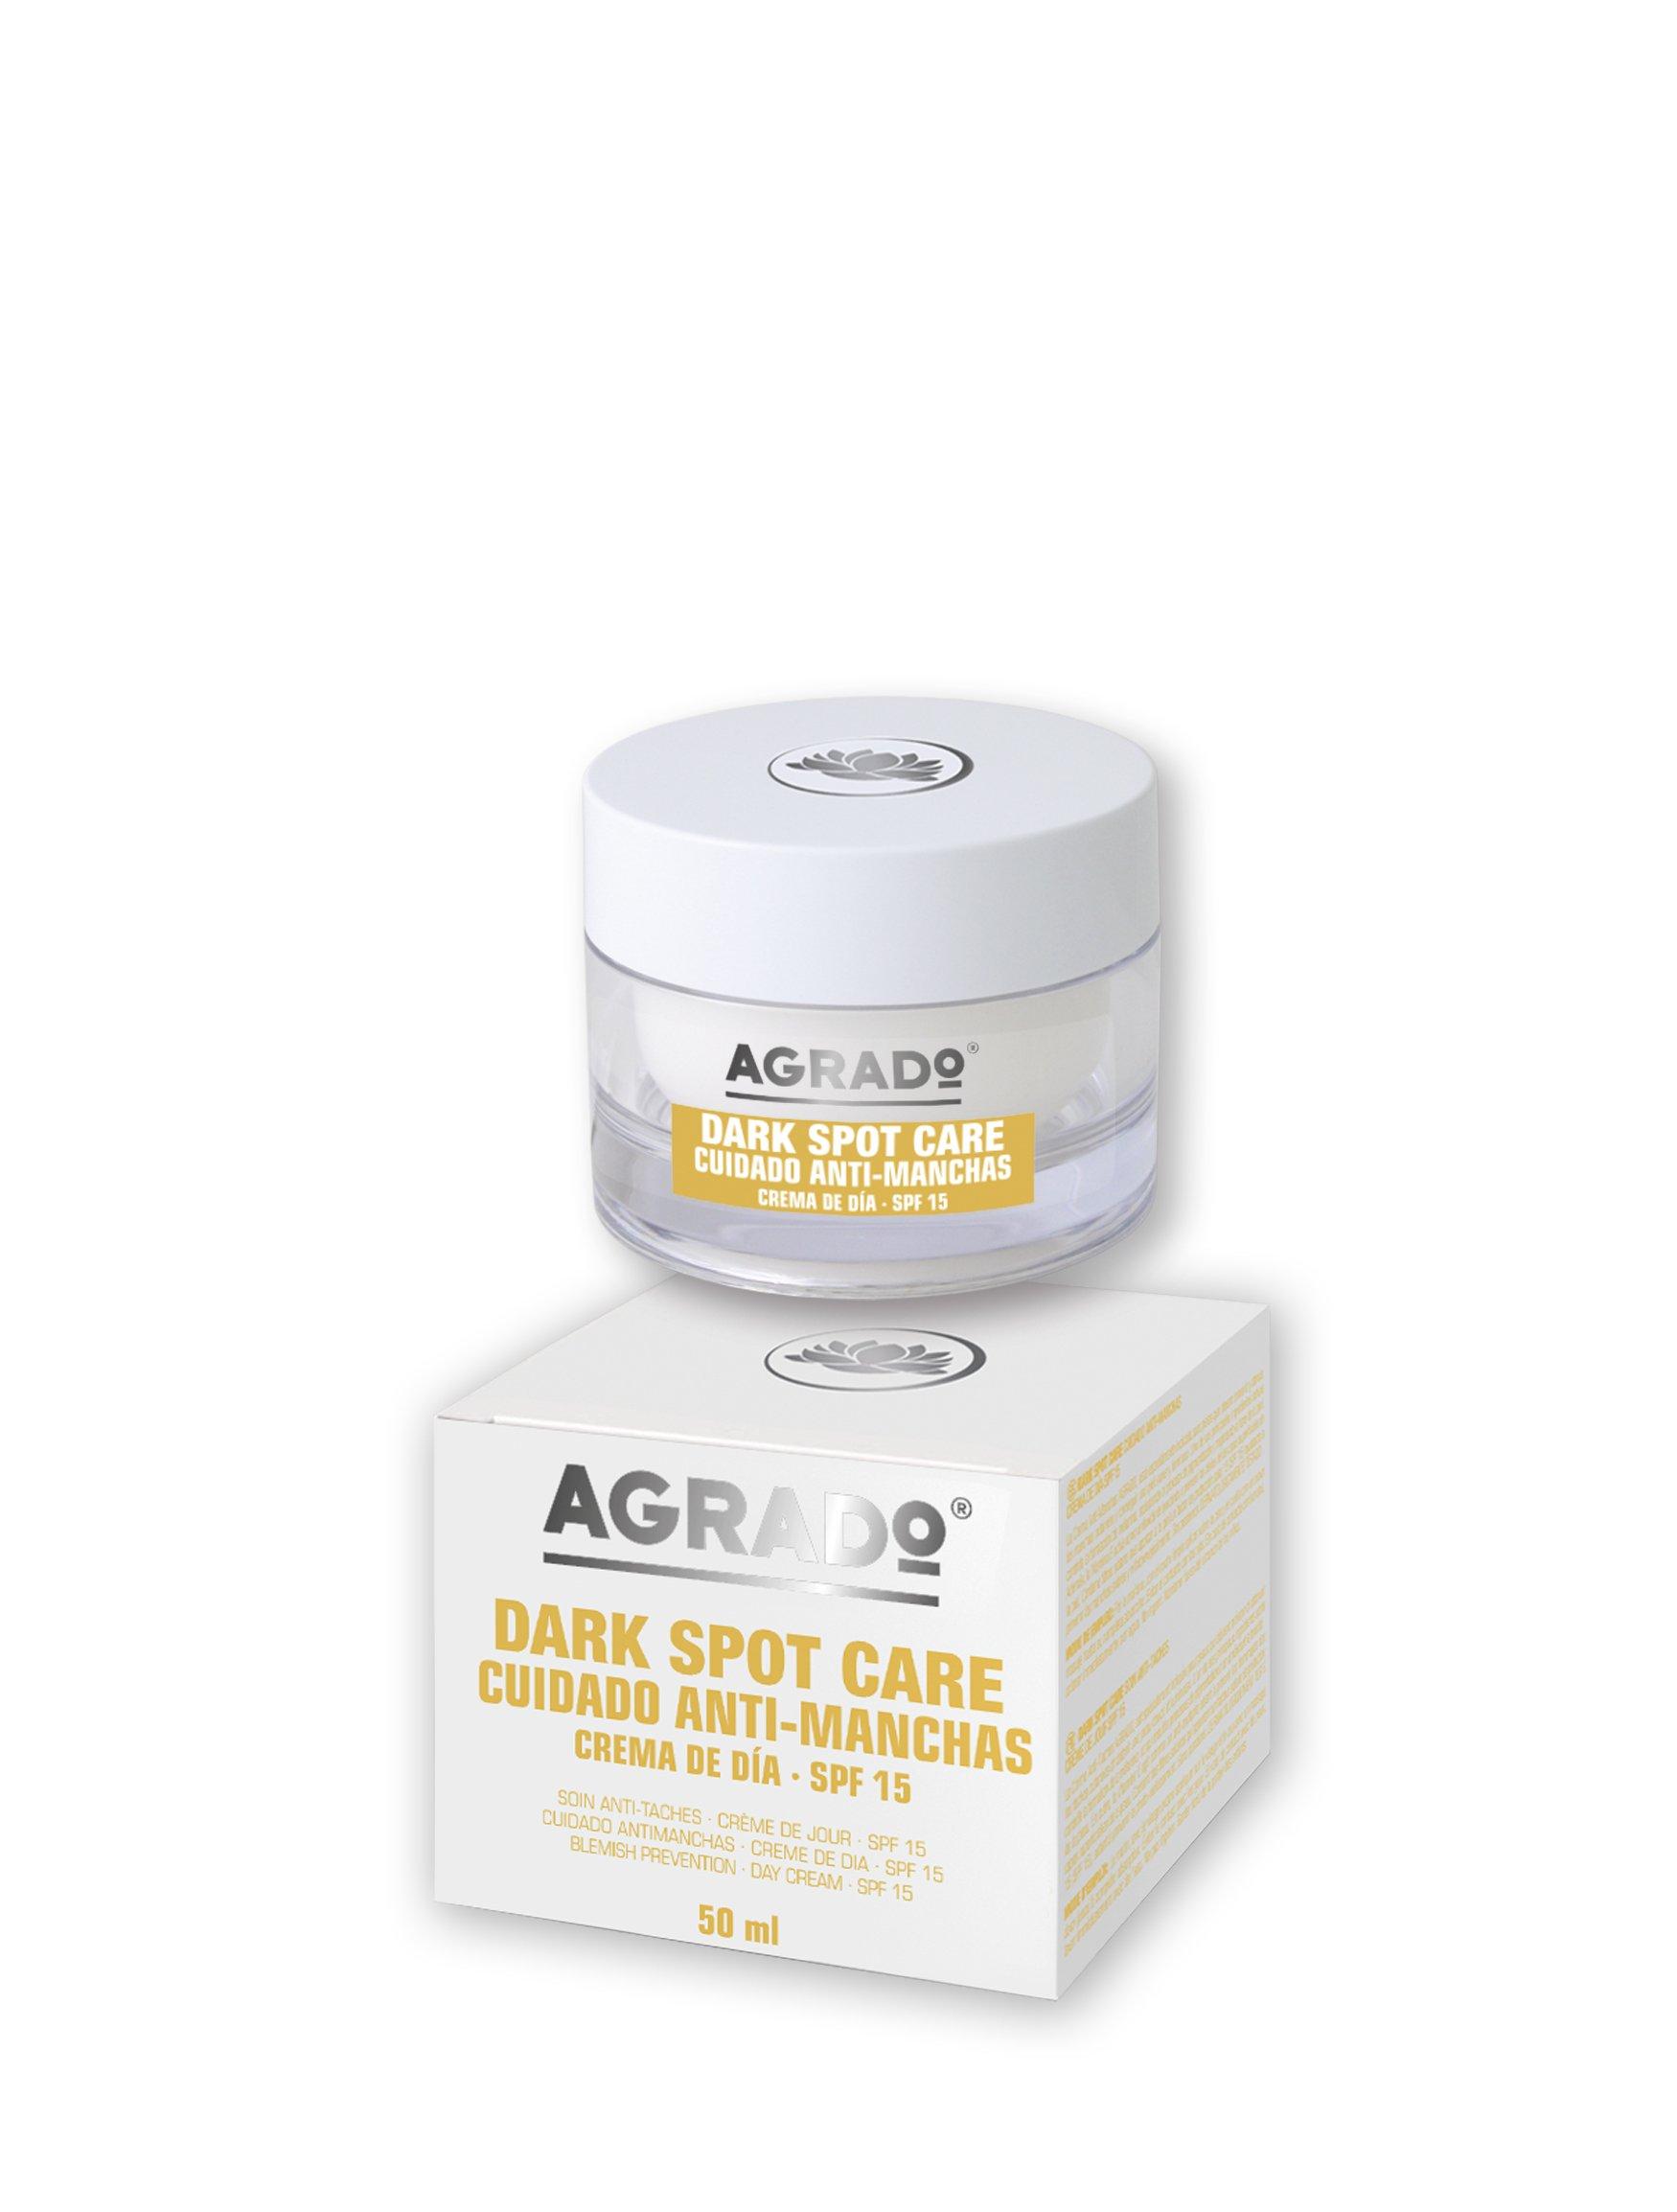 Agrado Dark Spot Care, Crema antimanchas